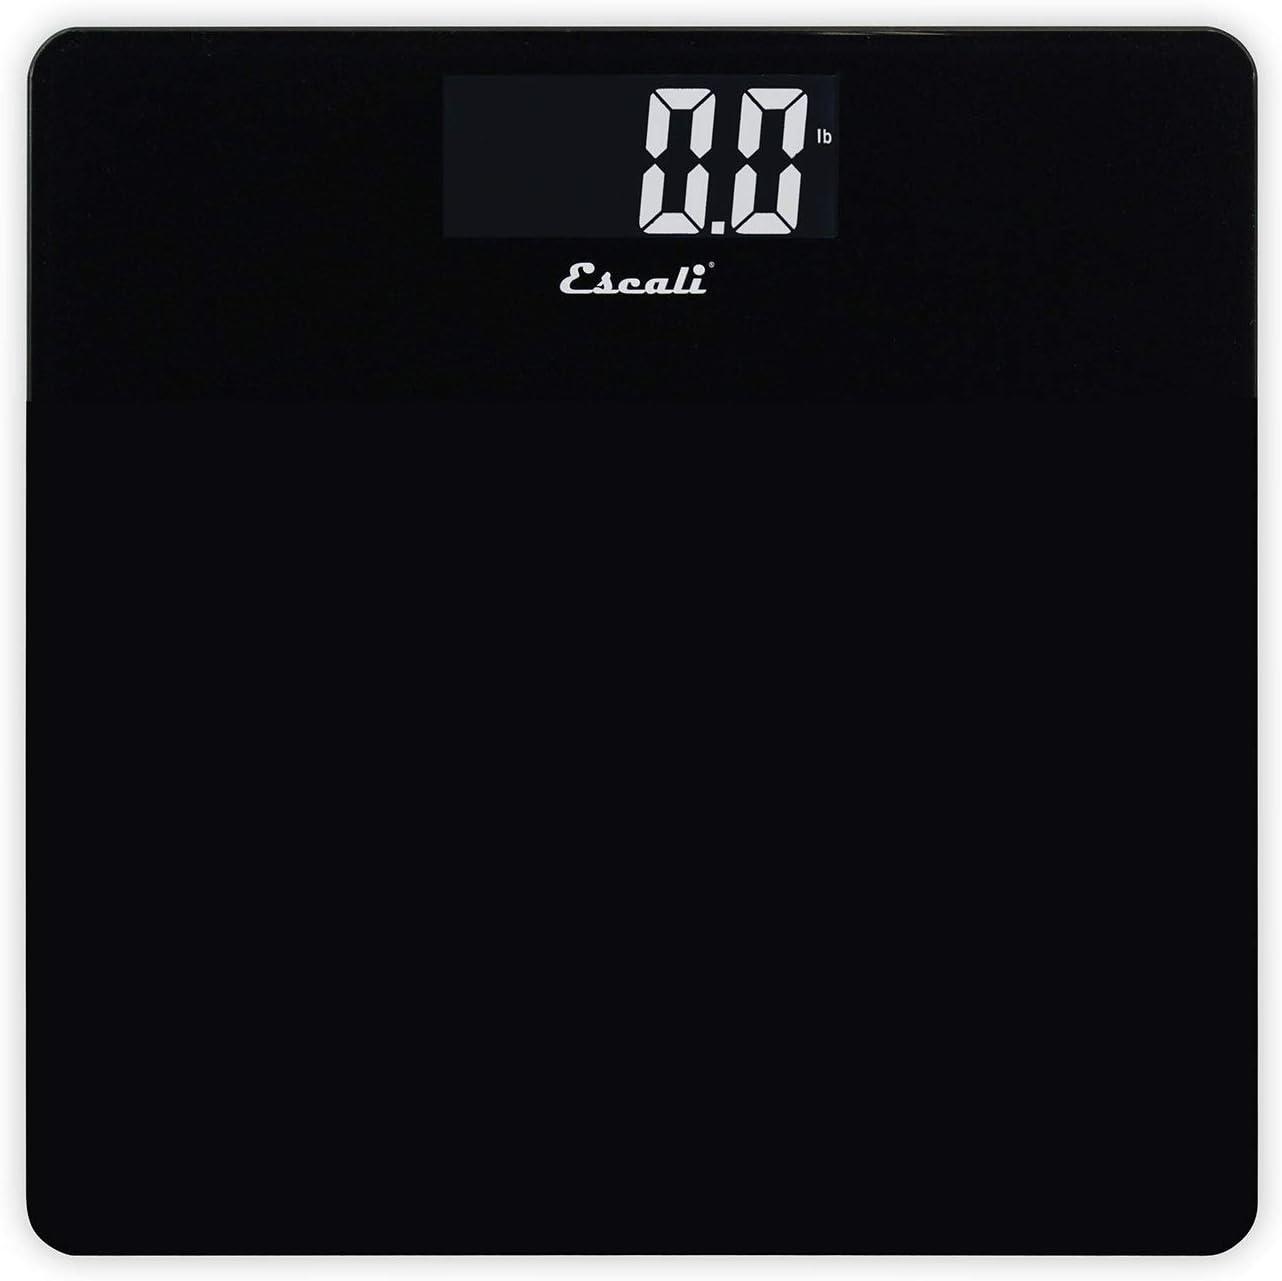 Escali B200B Glass Platform Bathroom Body Scale, Low Profile, LCD Digital Display, 440lb Capacity, Black